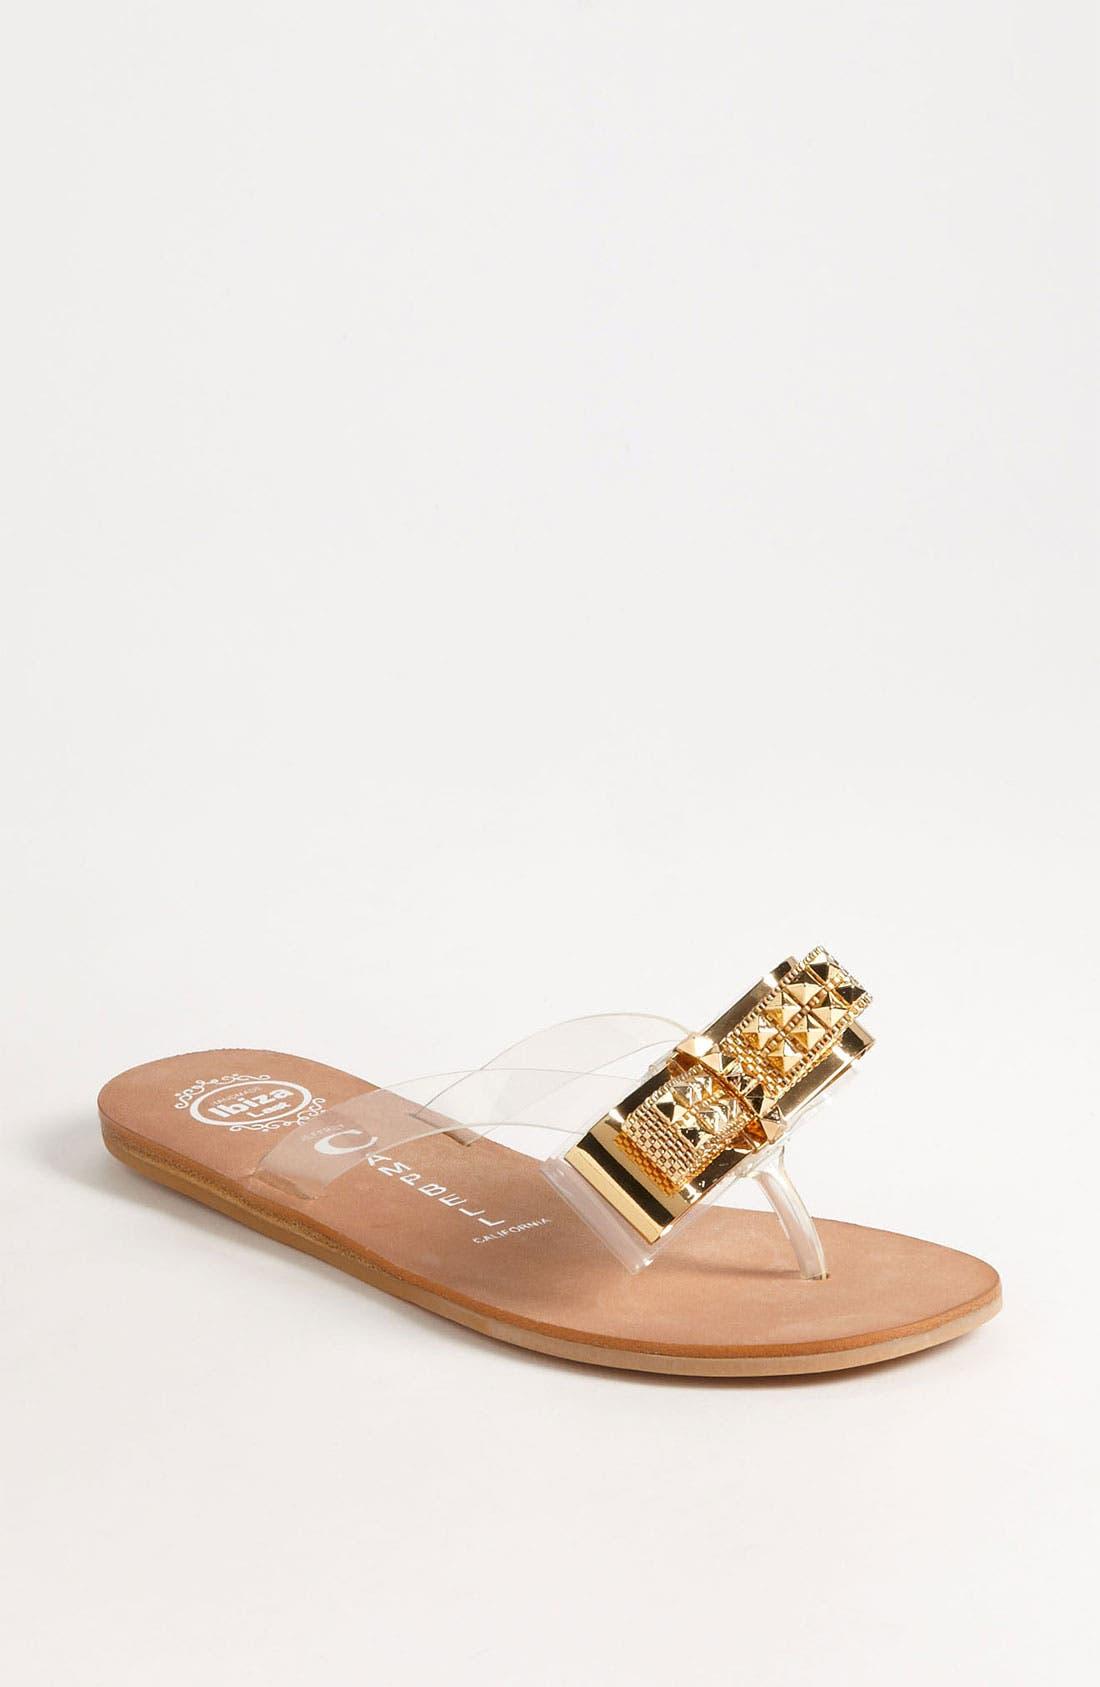 Main Image - Jeffrey Campbell 'Esme' Sandal